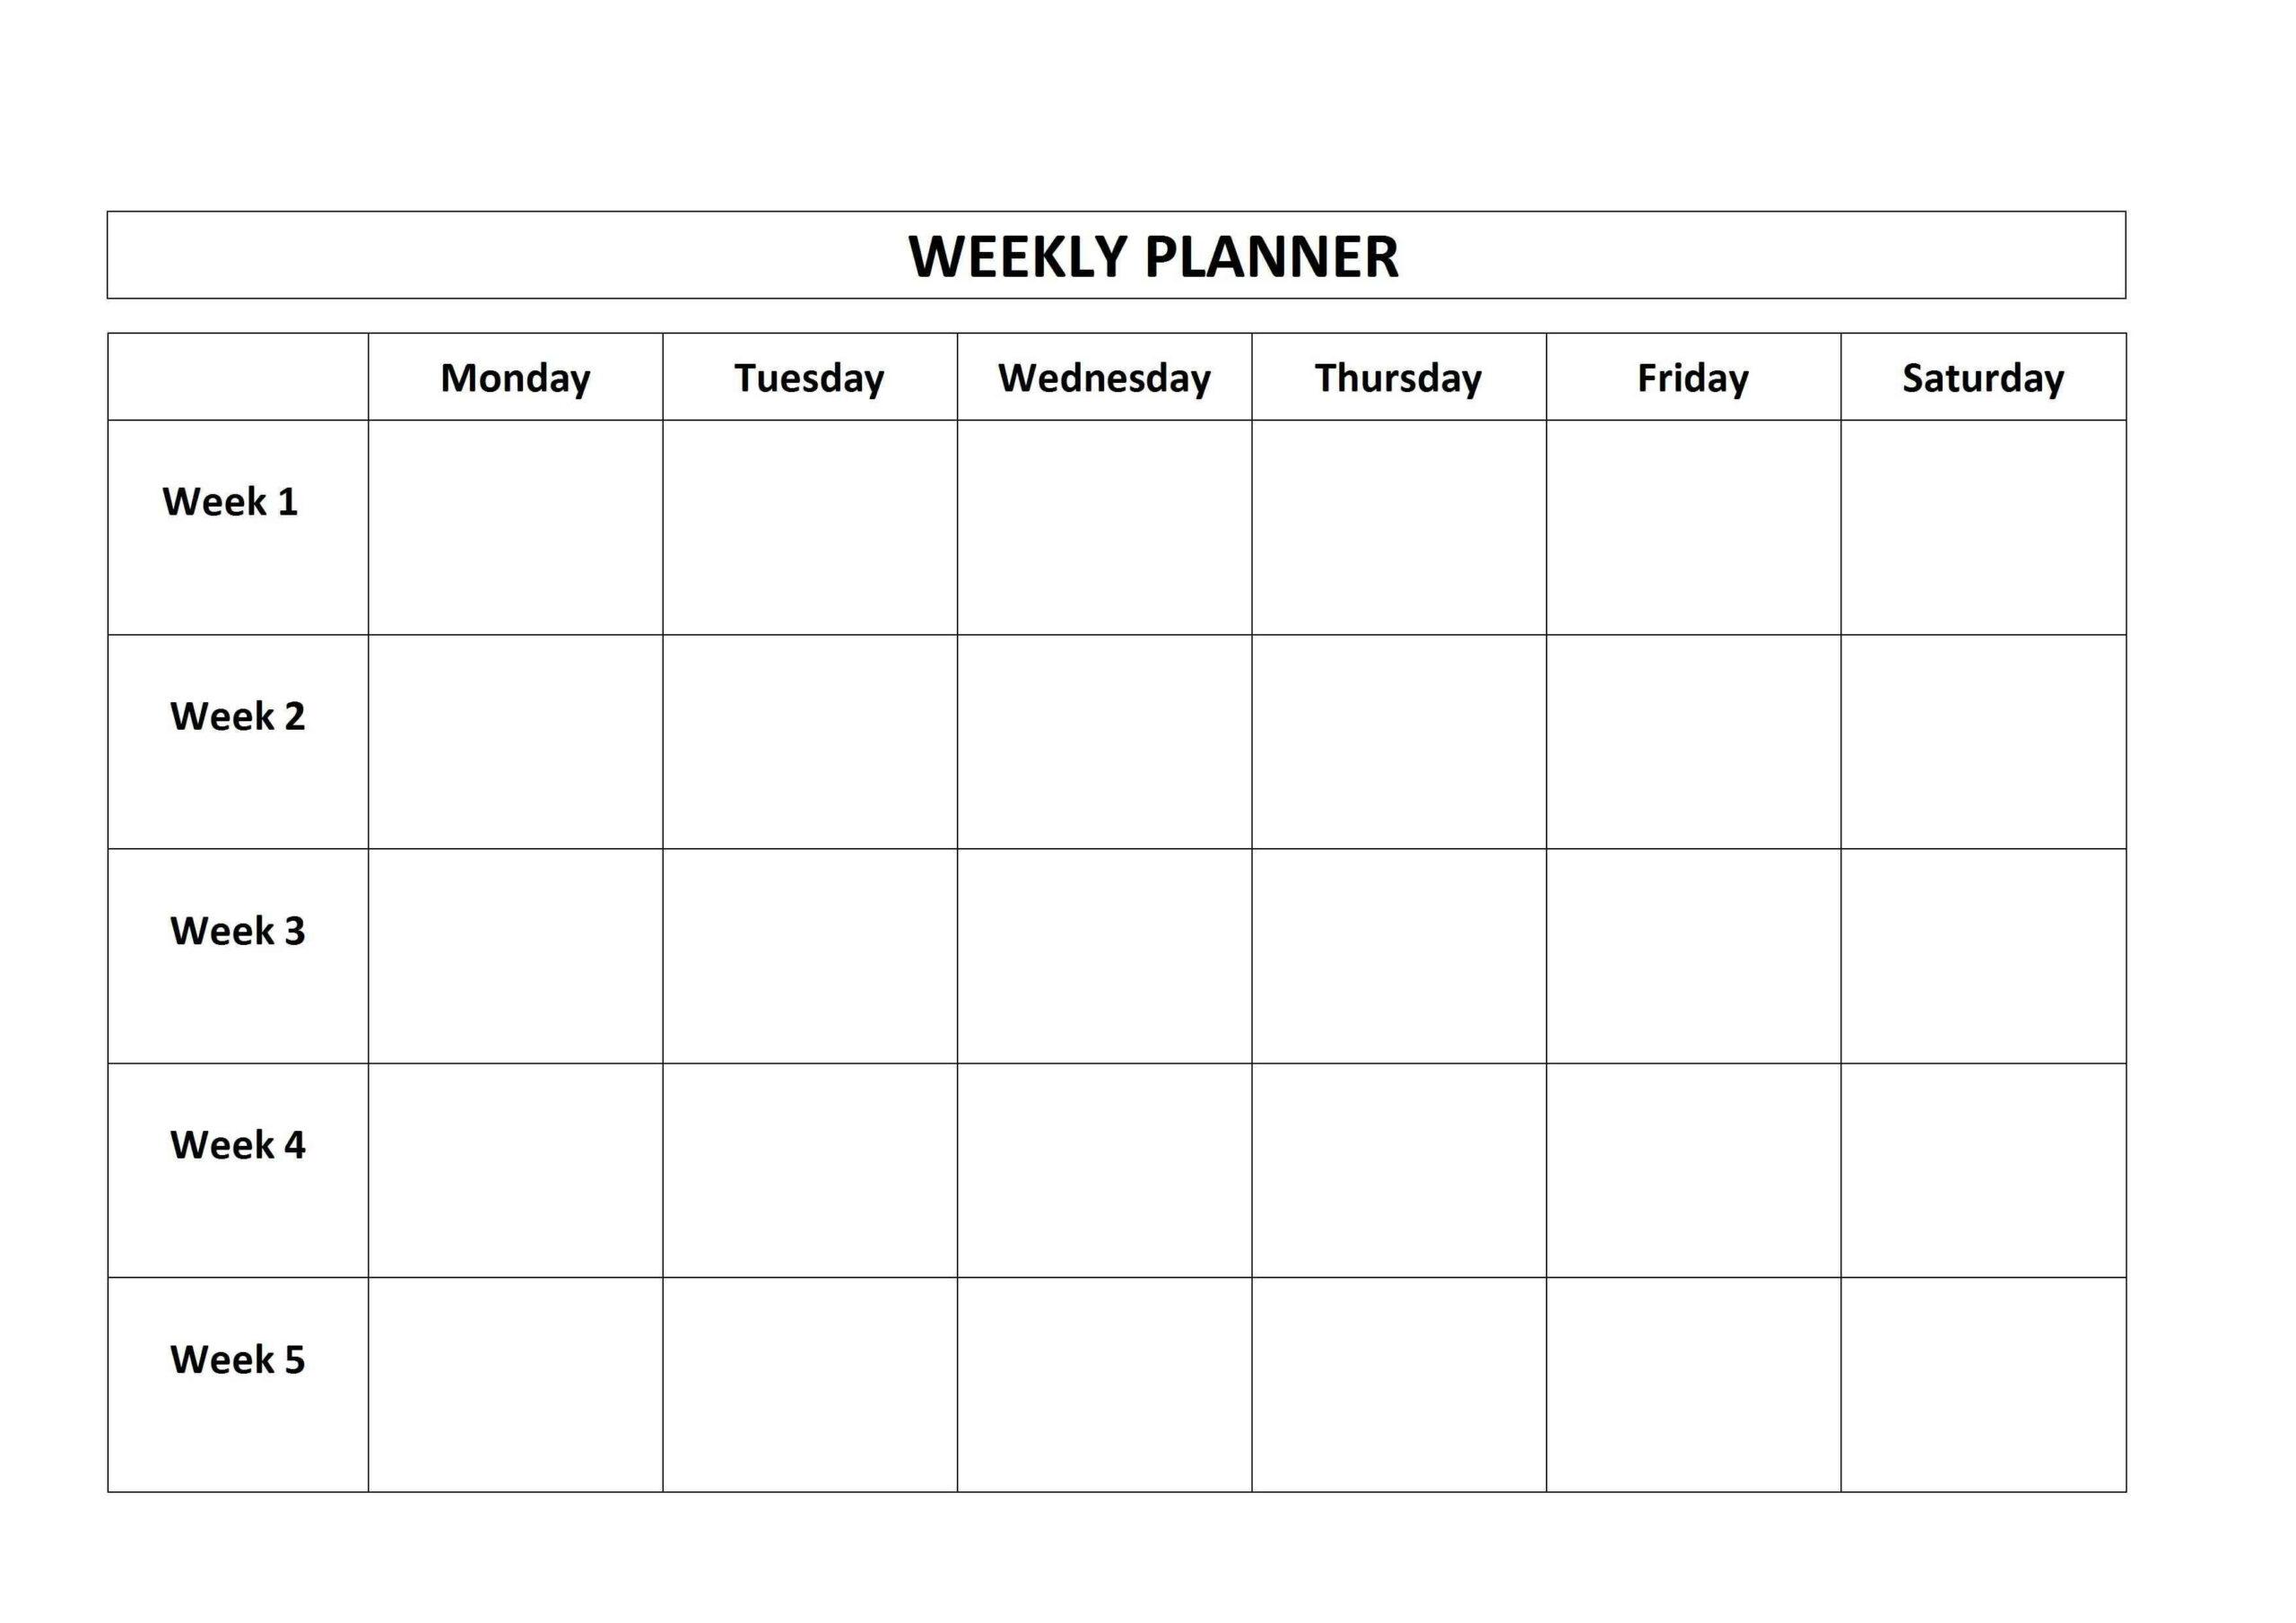 5 Day Calendar Template  Vaydile.euforic.coblank Calendar for 3 Week Blank Calendar